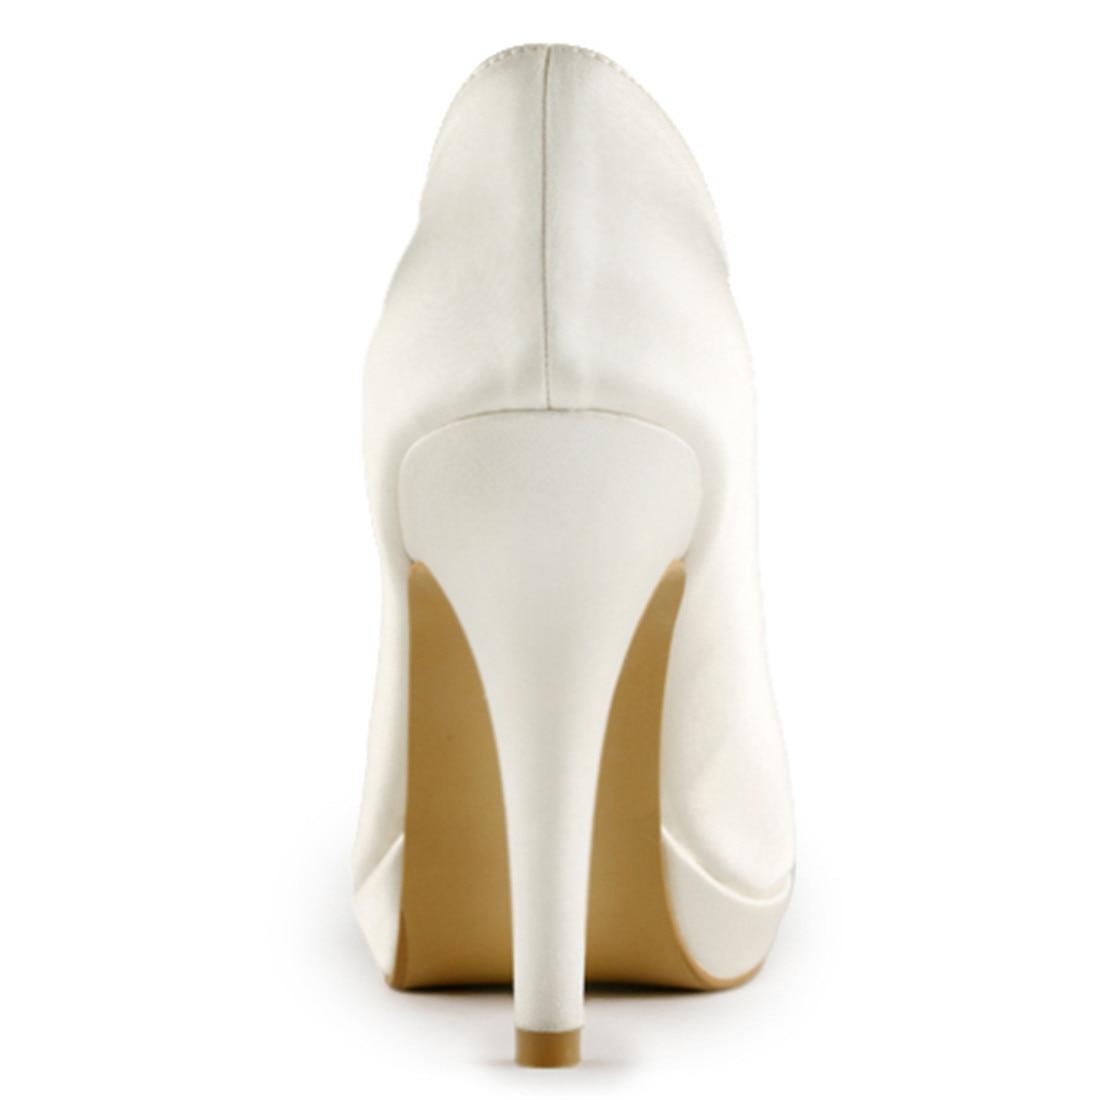 Elegant Thin High Heels Bridal Bridesmaid Ivory White Champagne Platform Pumps Luxury Satin Wedding Shoes Uninnova 521 1 LY - 6